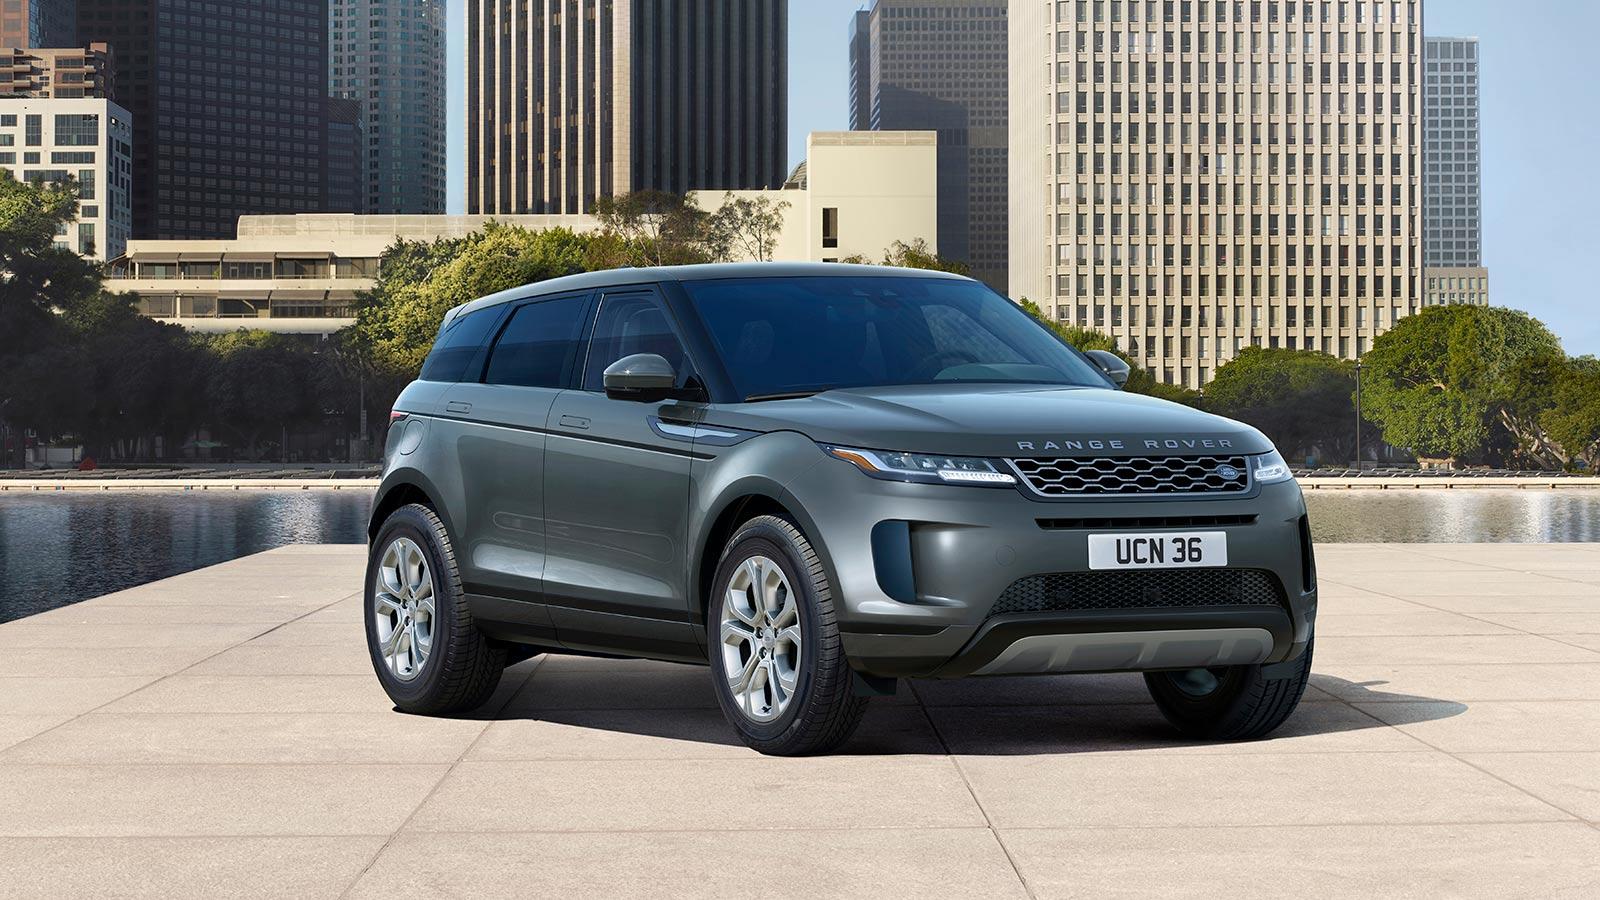 2022 Range Rover Evoque